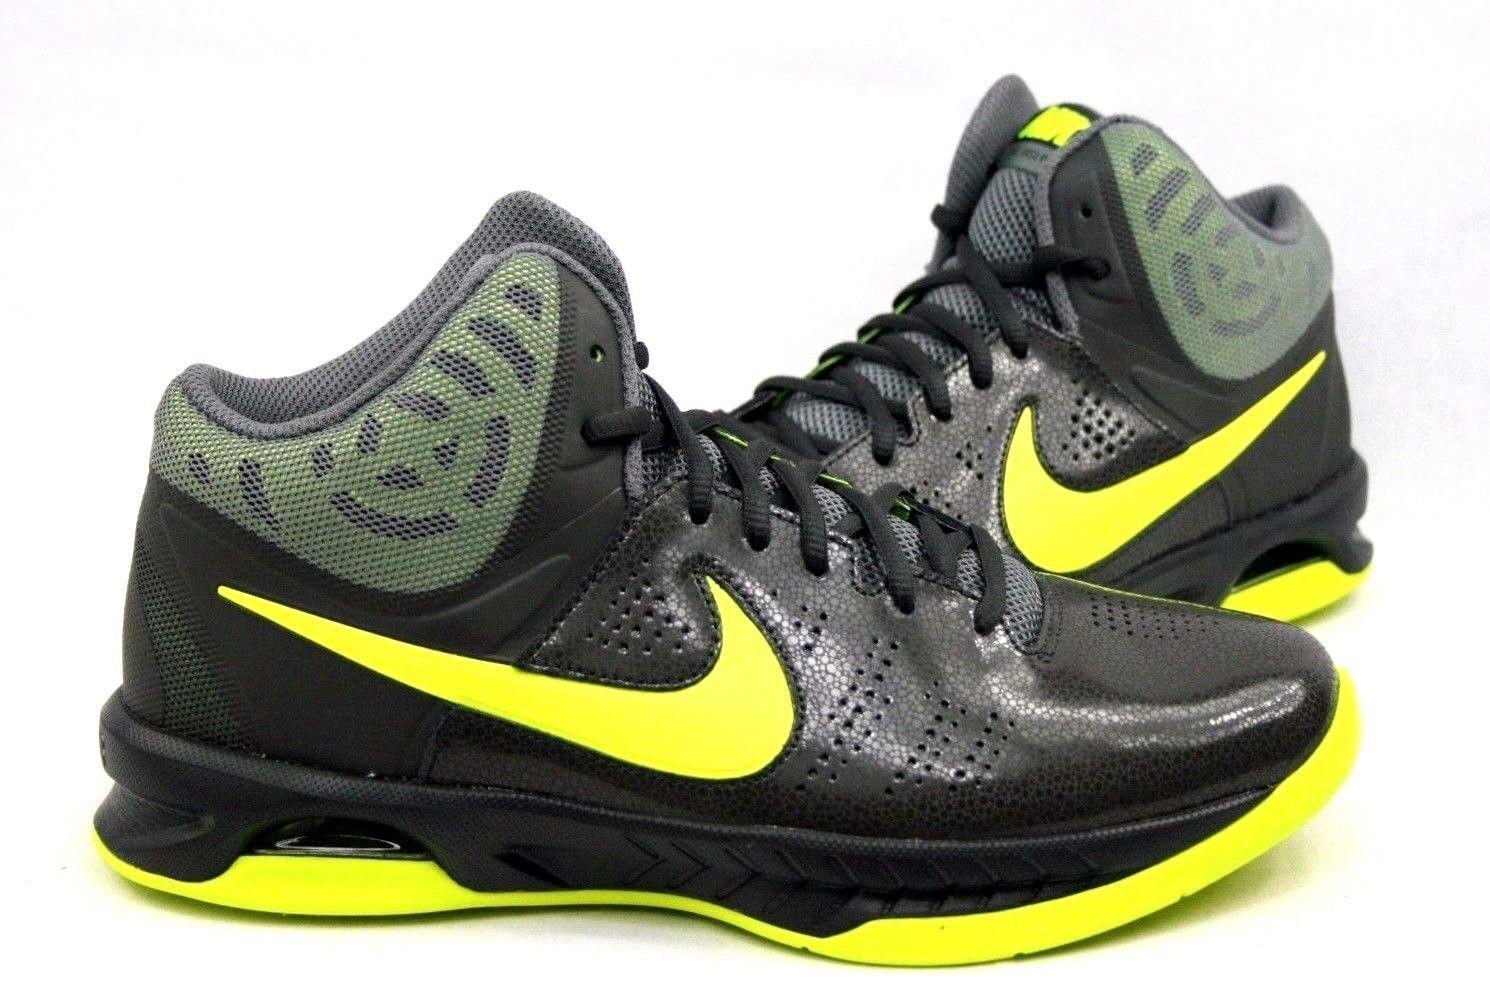 Nike VI Hommes Air Visi Pro VI Nike Athletic / Basketball Chaussures 749167-200 SZ 9.5 6476aa